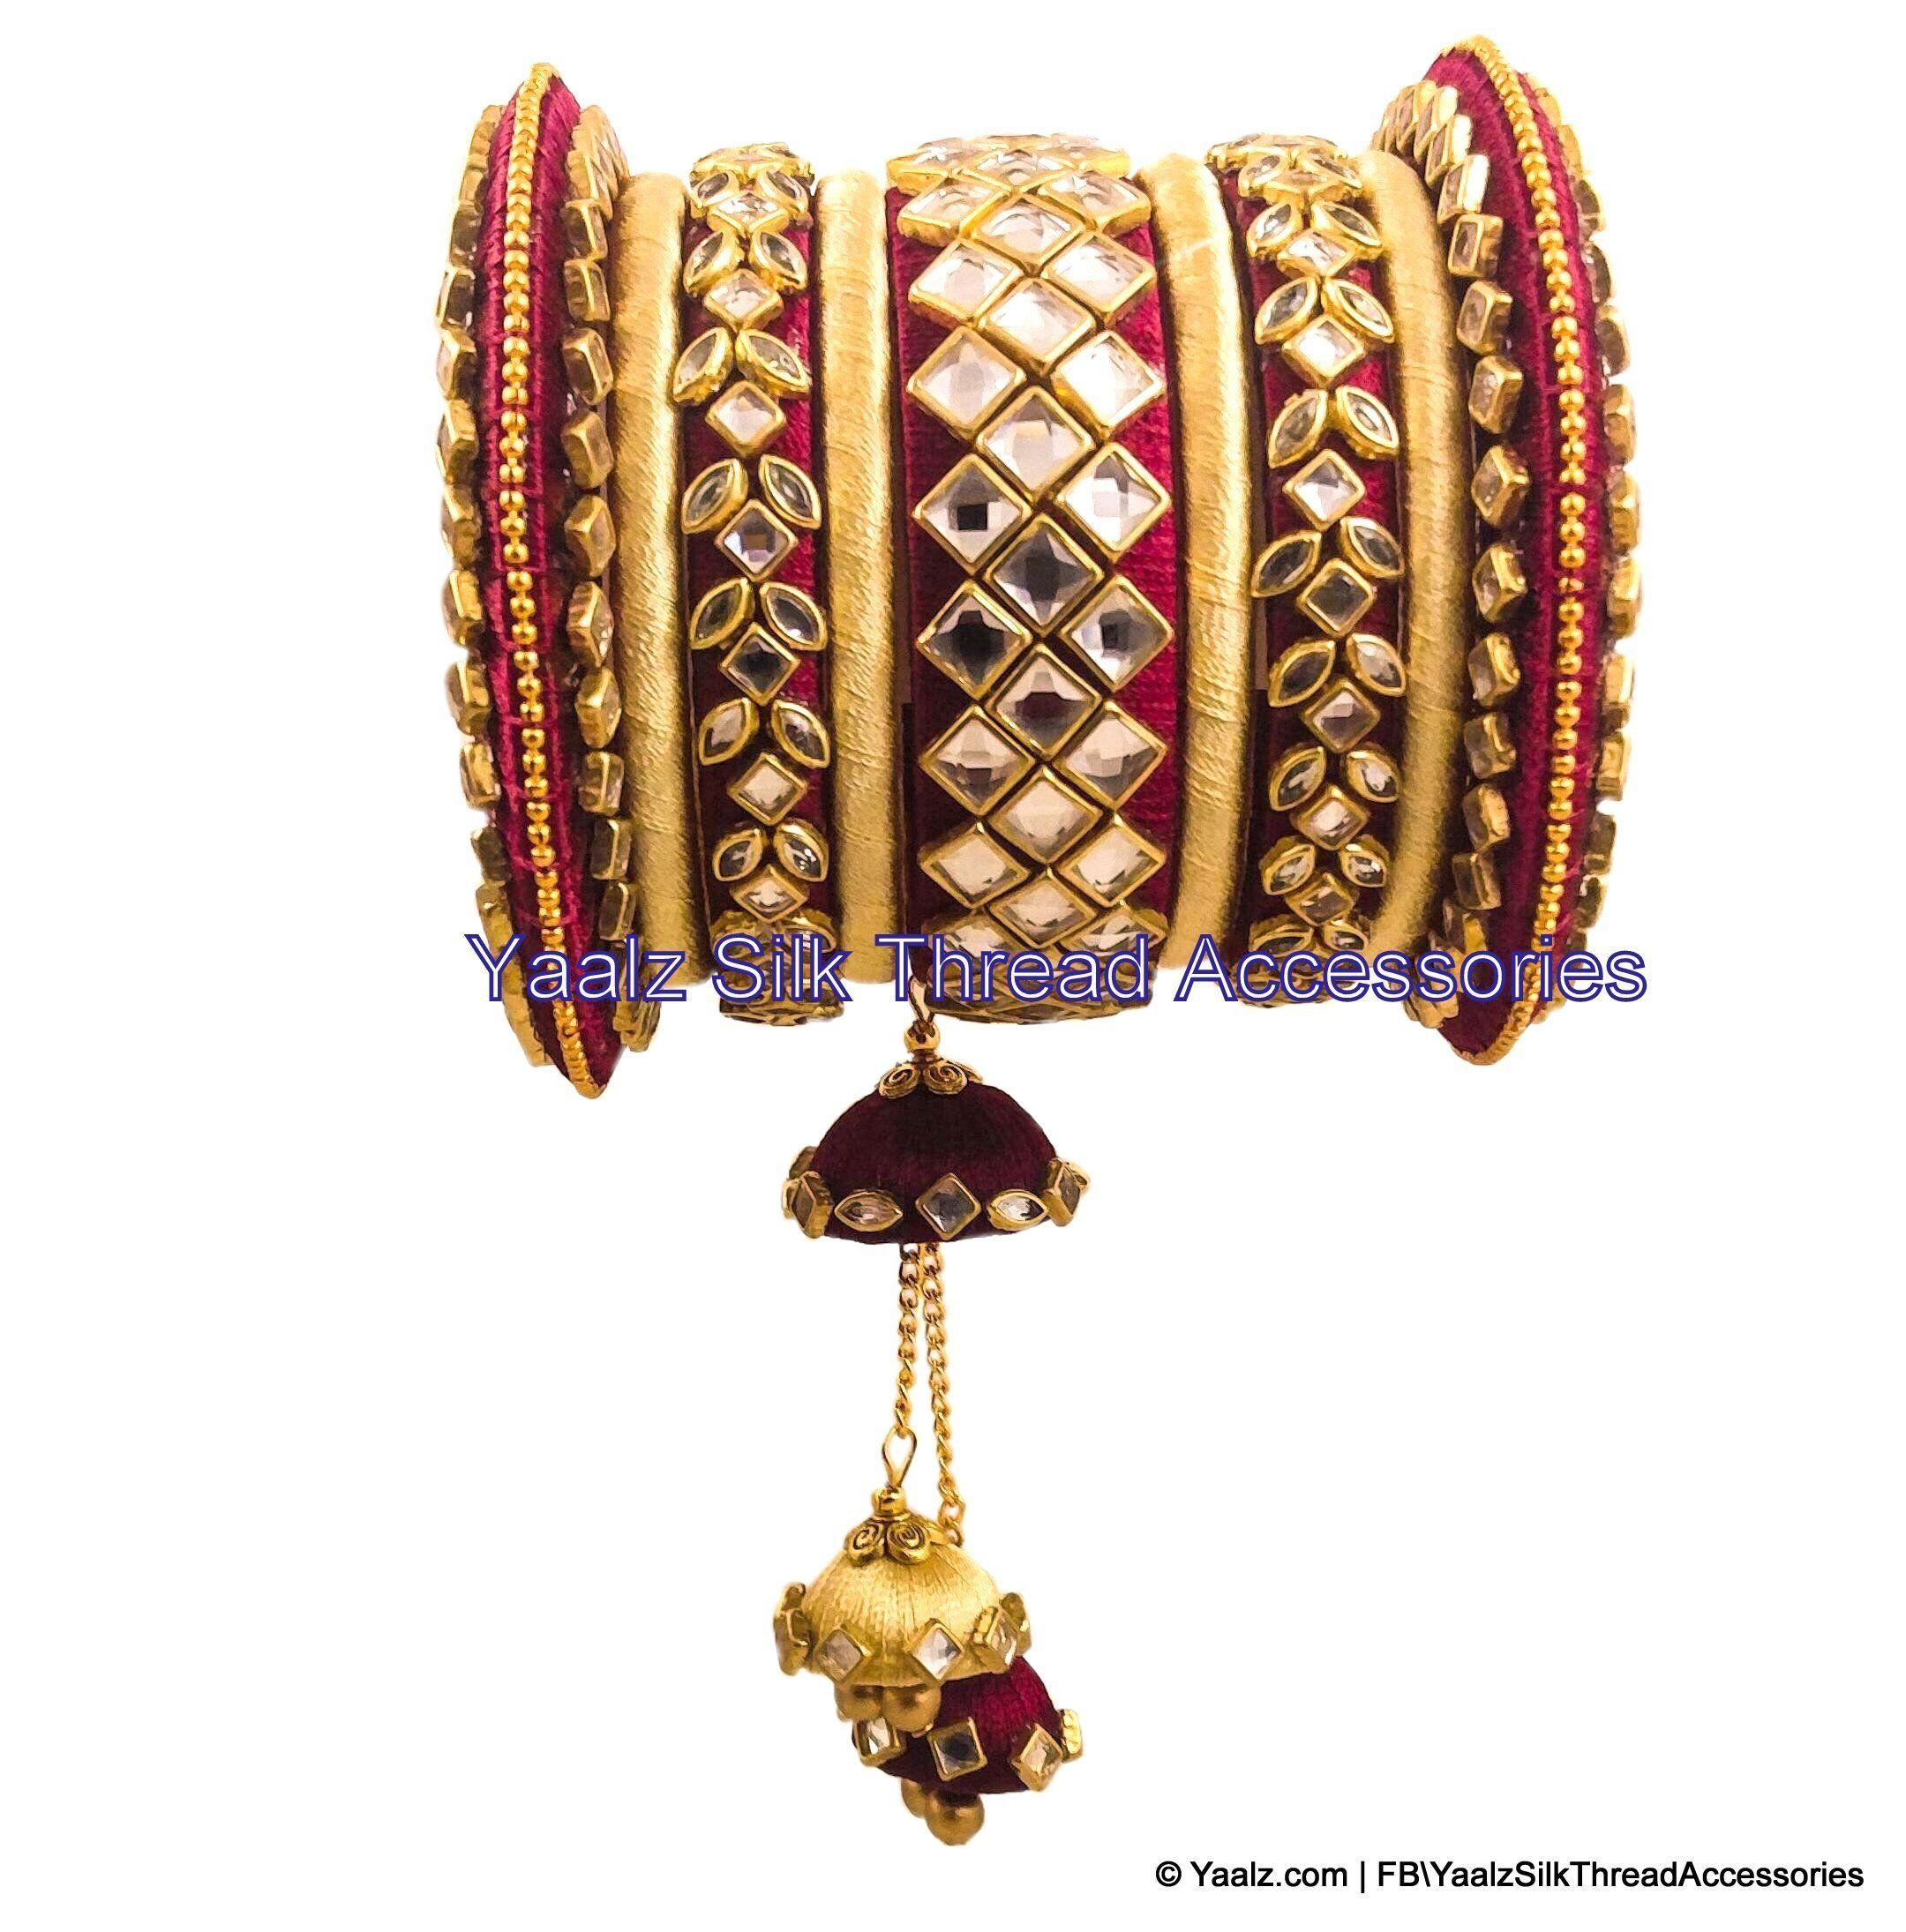 1fe730231 Yaalz Silk Thread Heavy Kundan Stone Bridal Bangle Set In Maroon & Cream  Colors